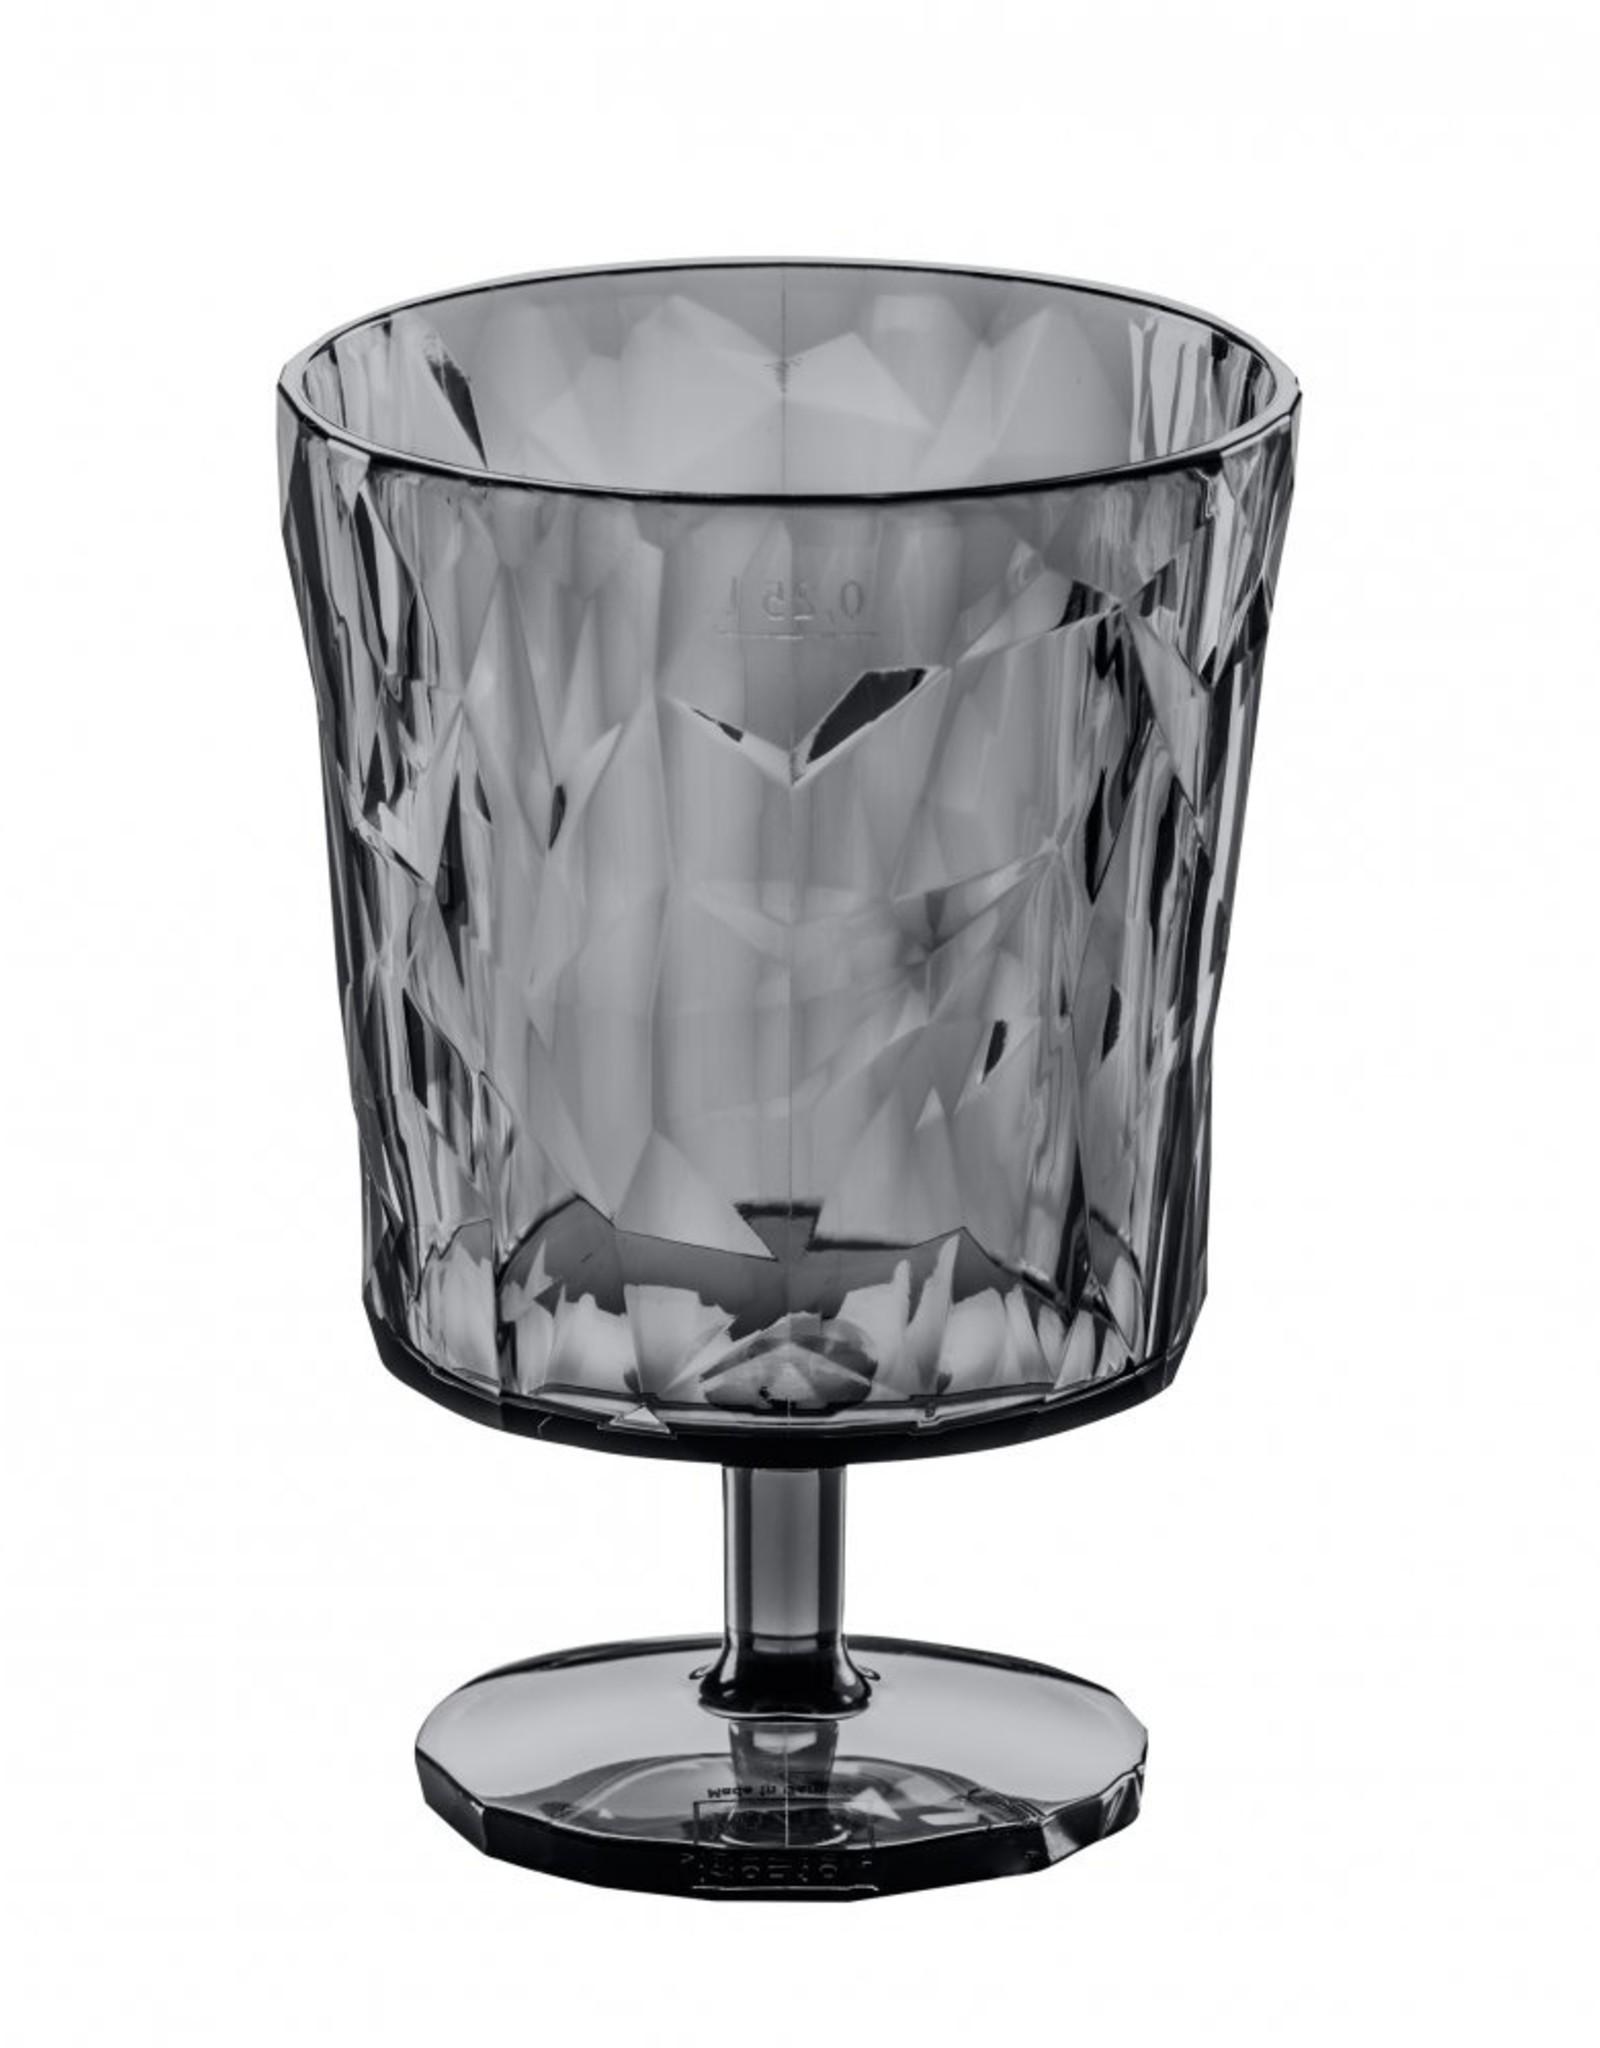 Koziol Koziol CLUB S Drinkglas 250ml transparent grey